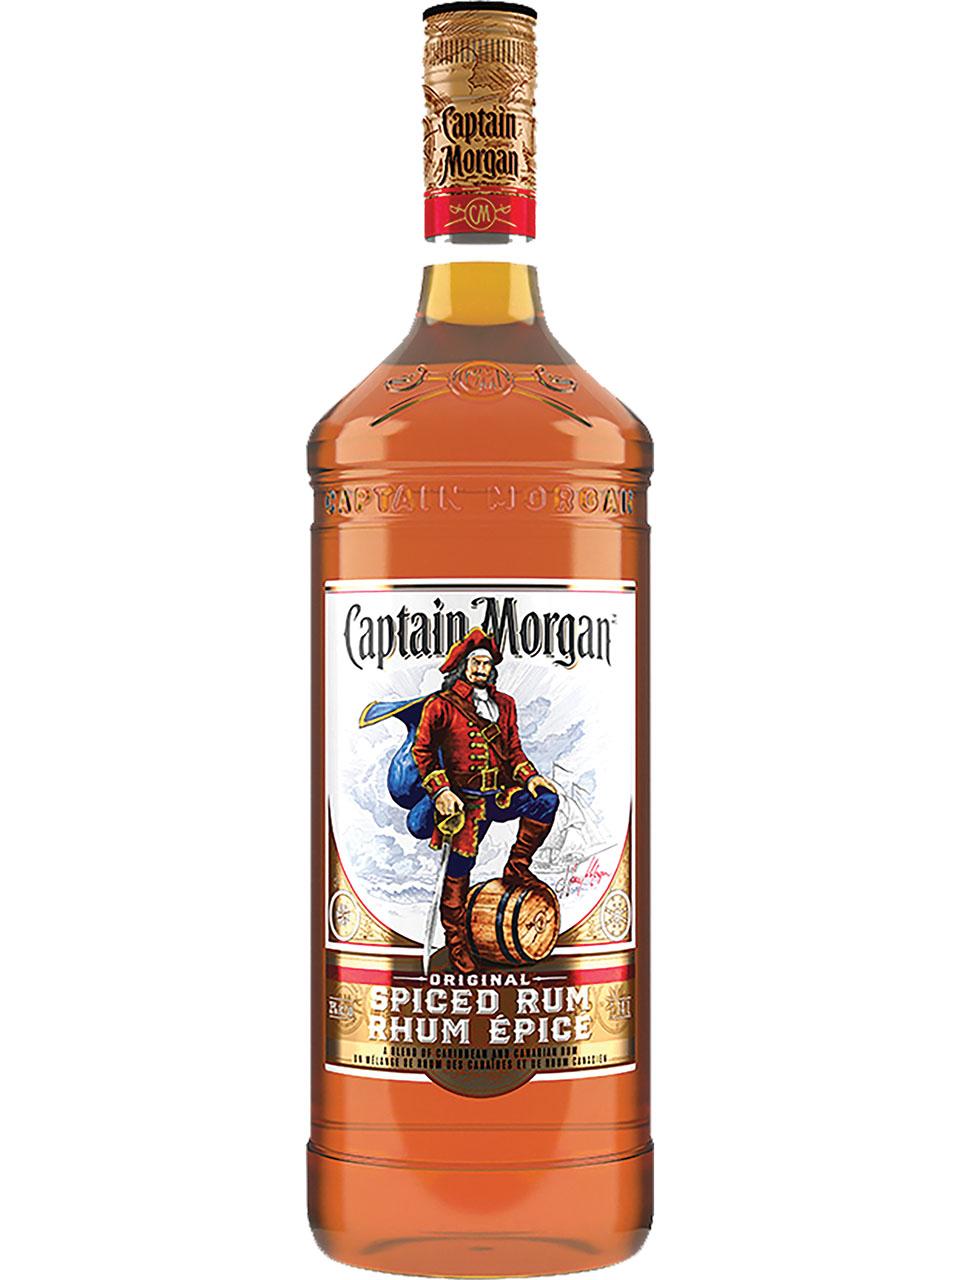 Captain Morgan Original Spiced Rum